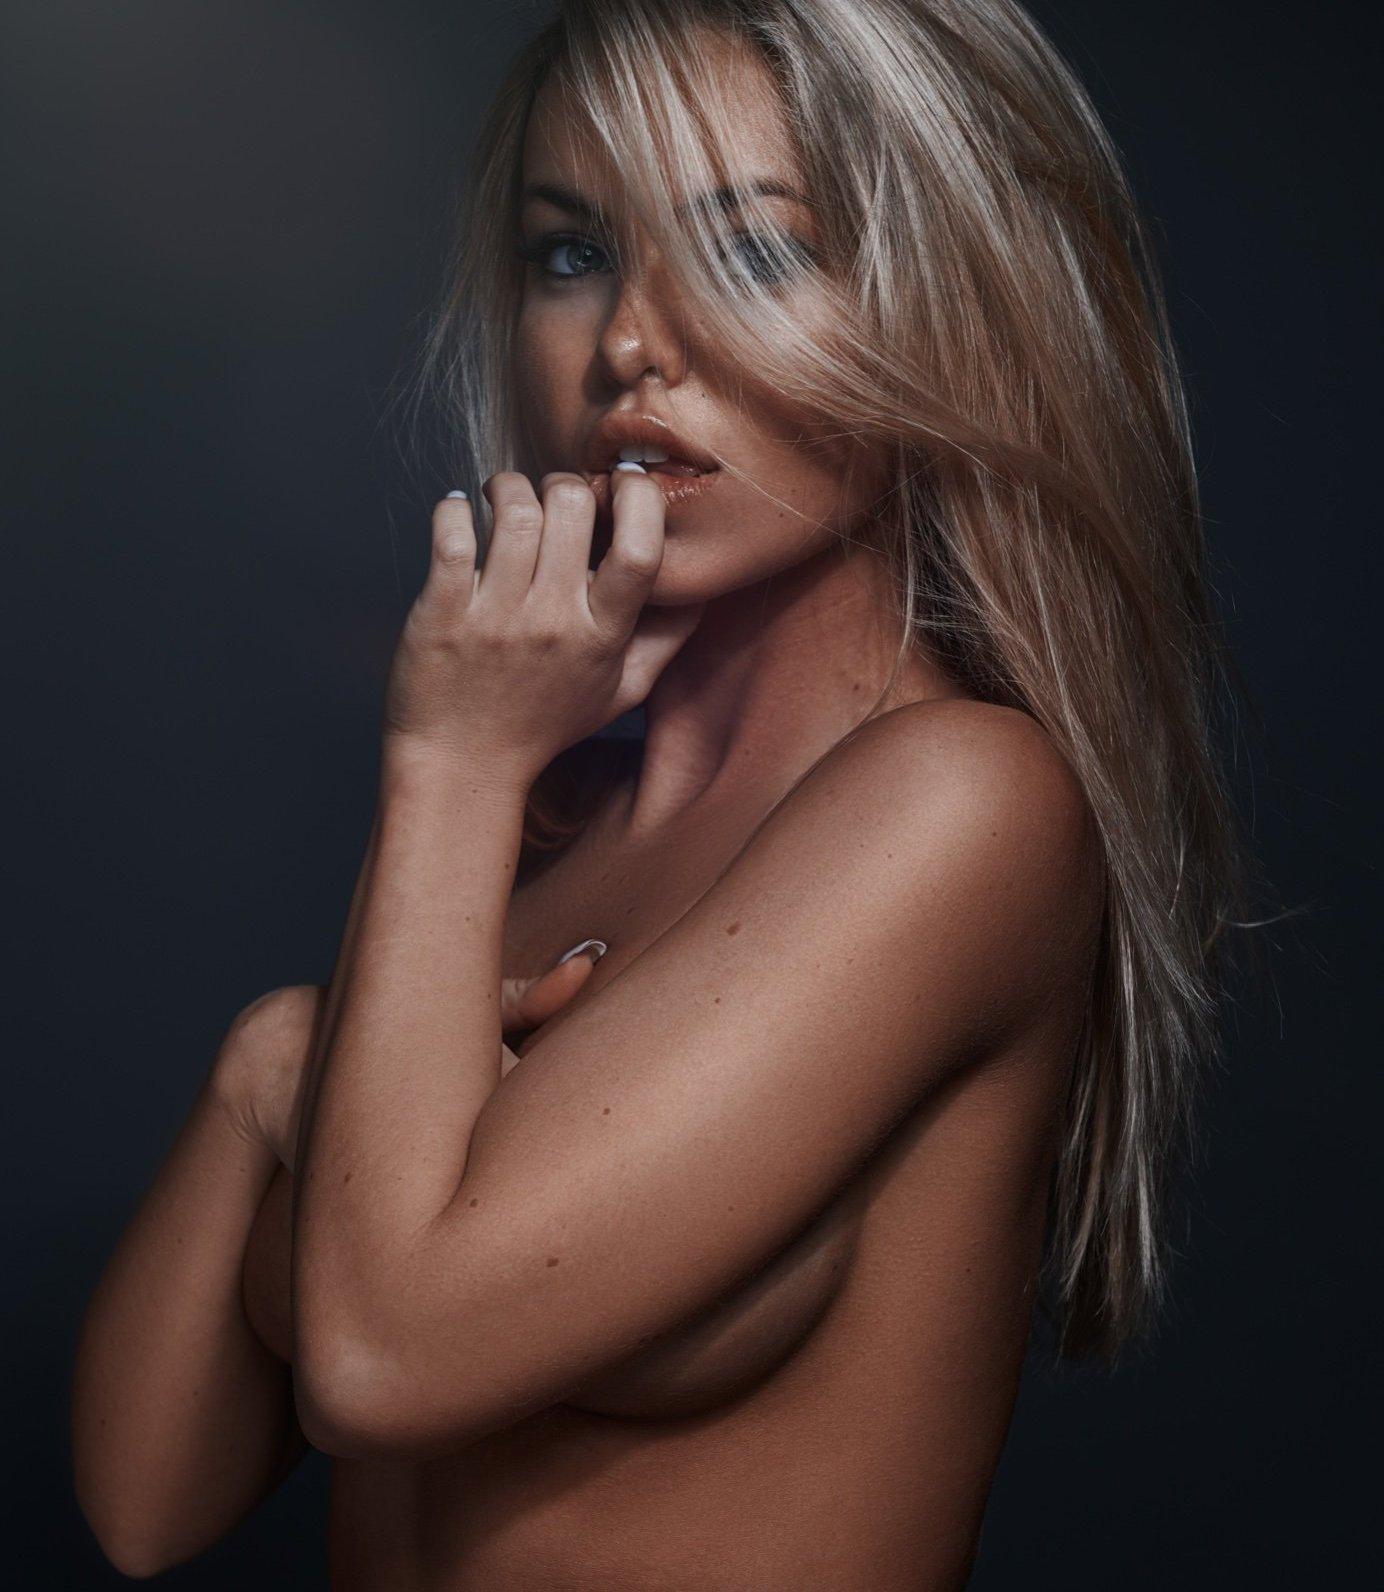 Emma Kotos Emmakotos Instagram Nude Leaks 0011